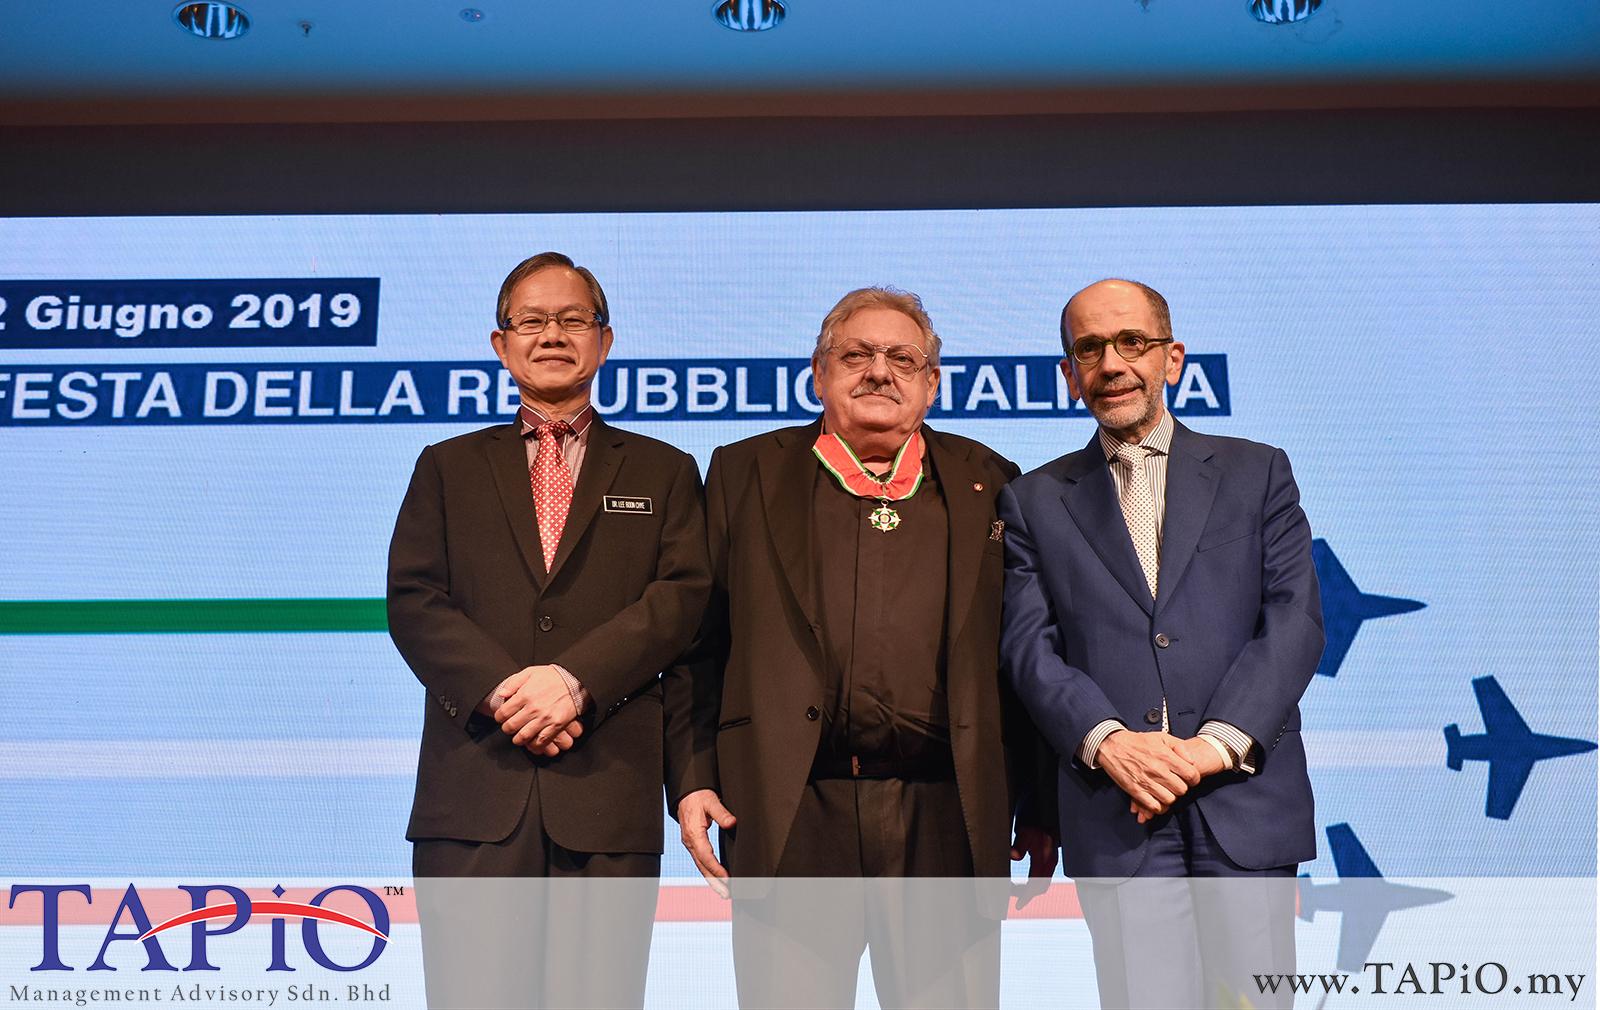 Italian National Day - 19/06/2019